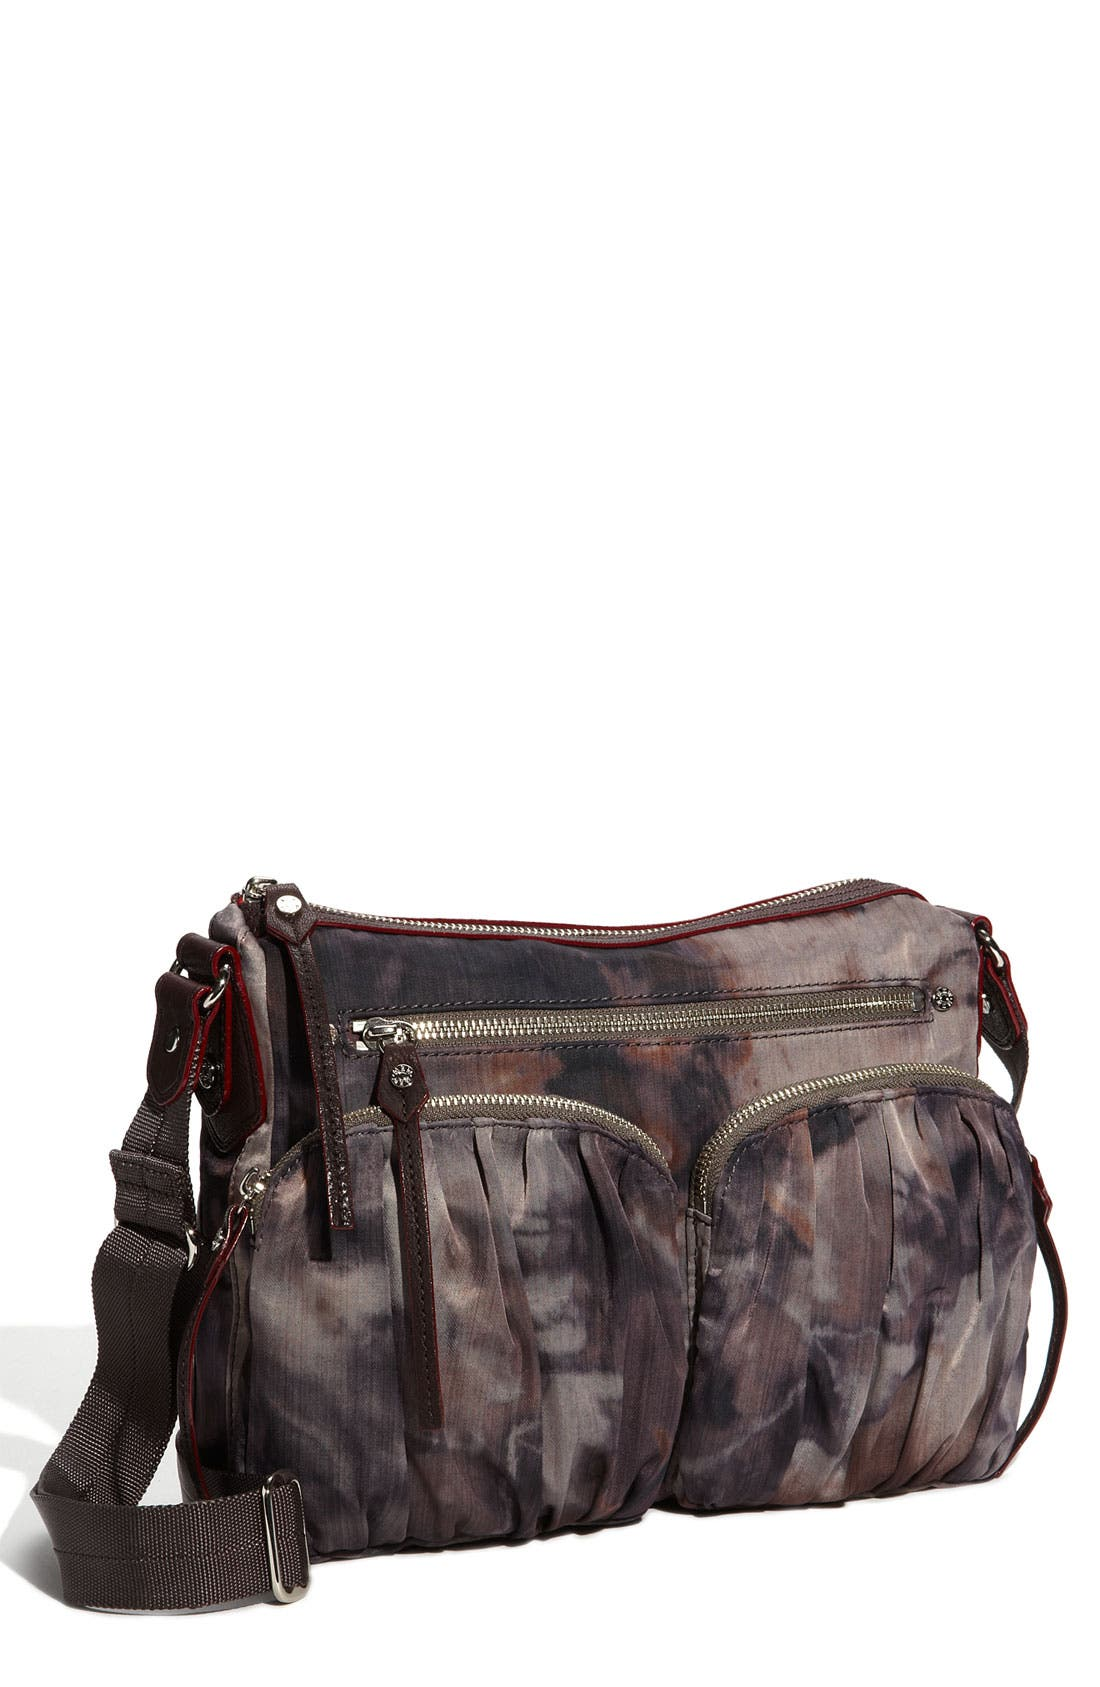 'Paige - Night Storm' Crossbody Bag, Main, color, 500